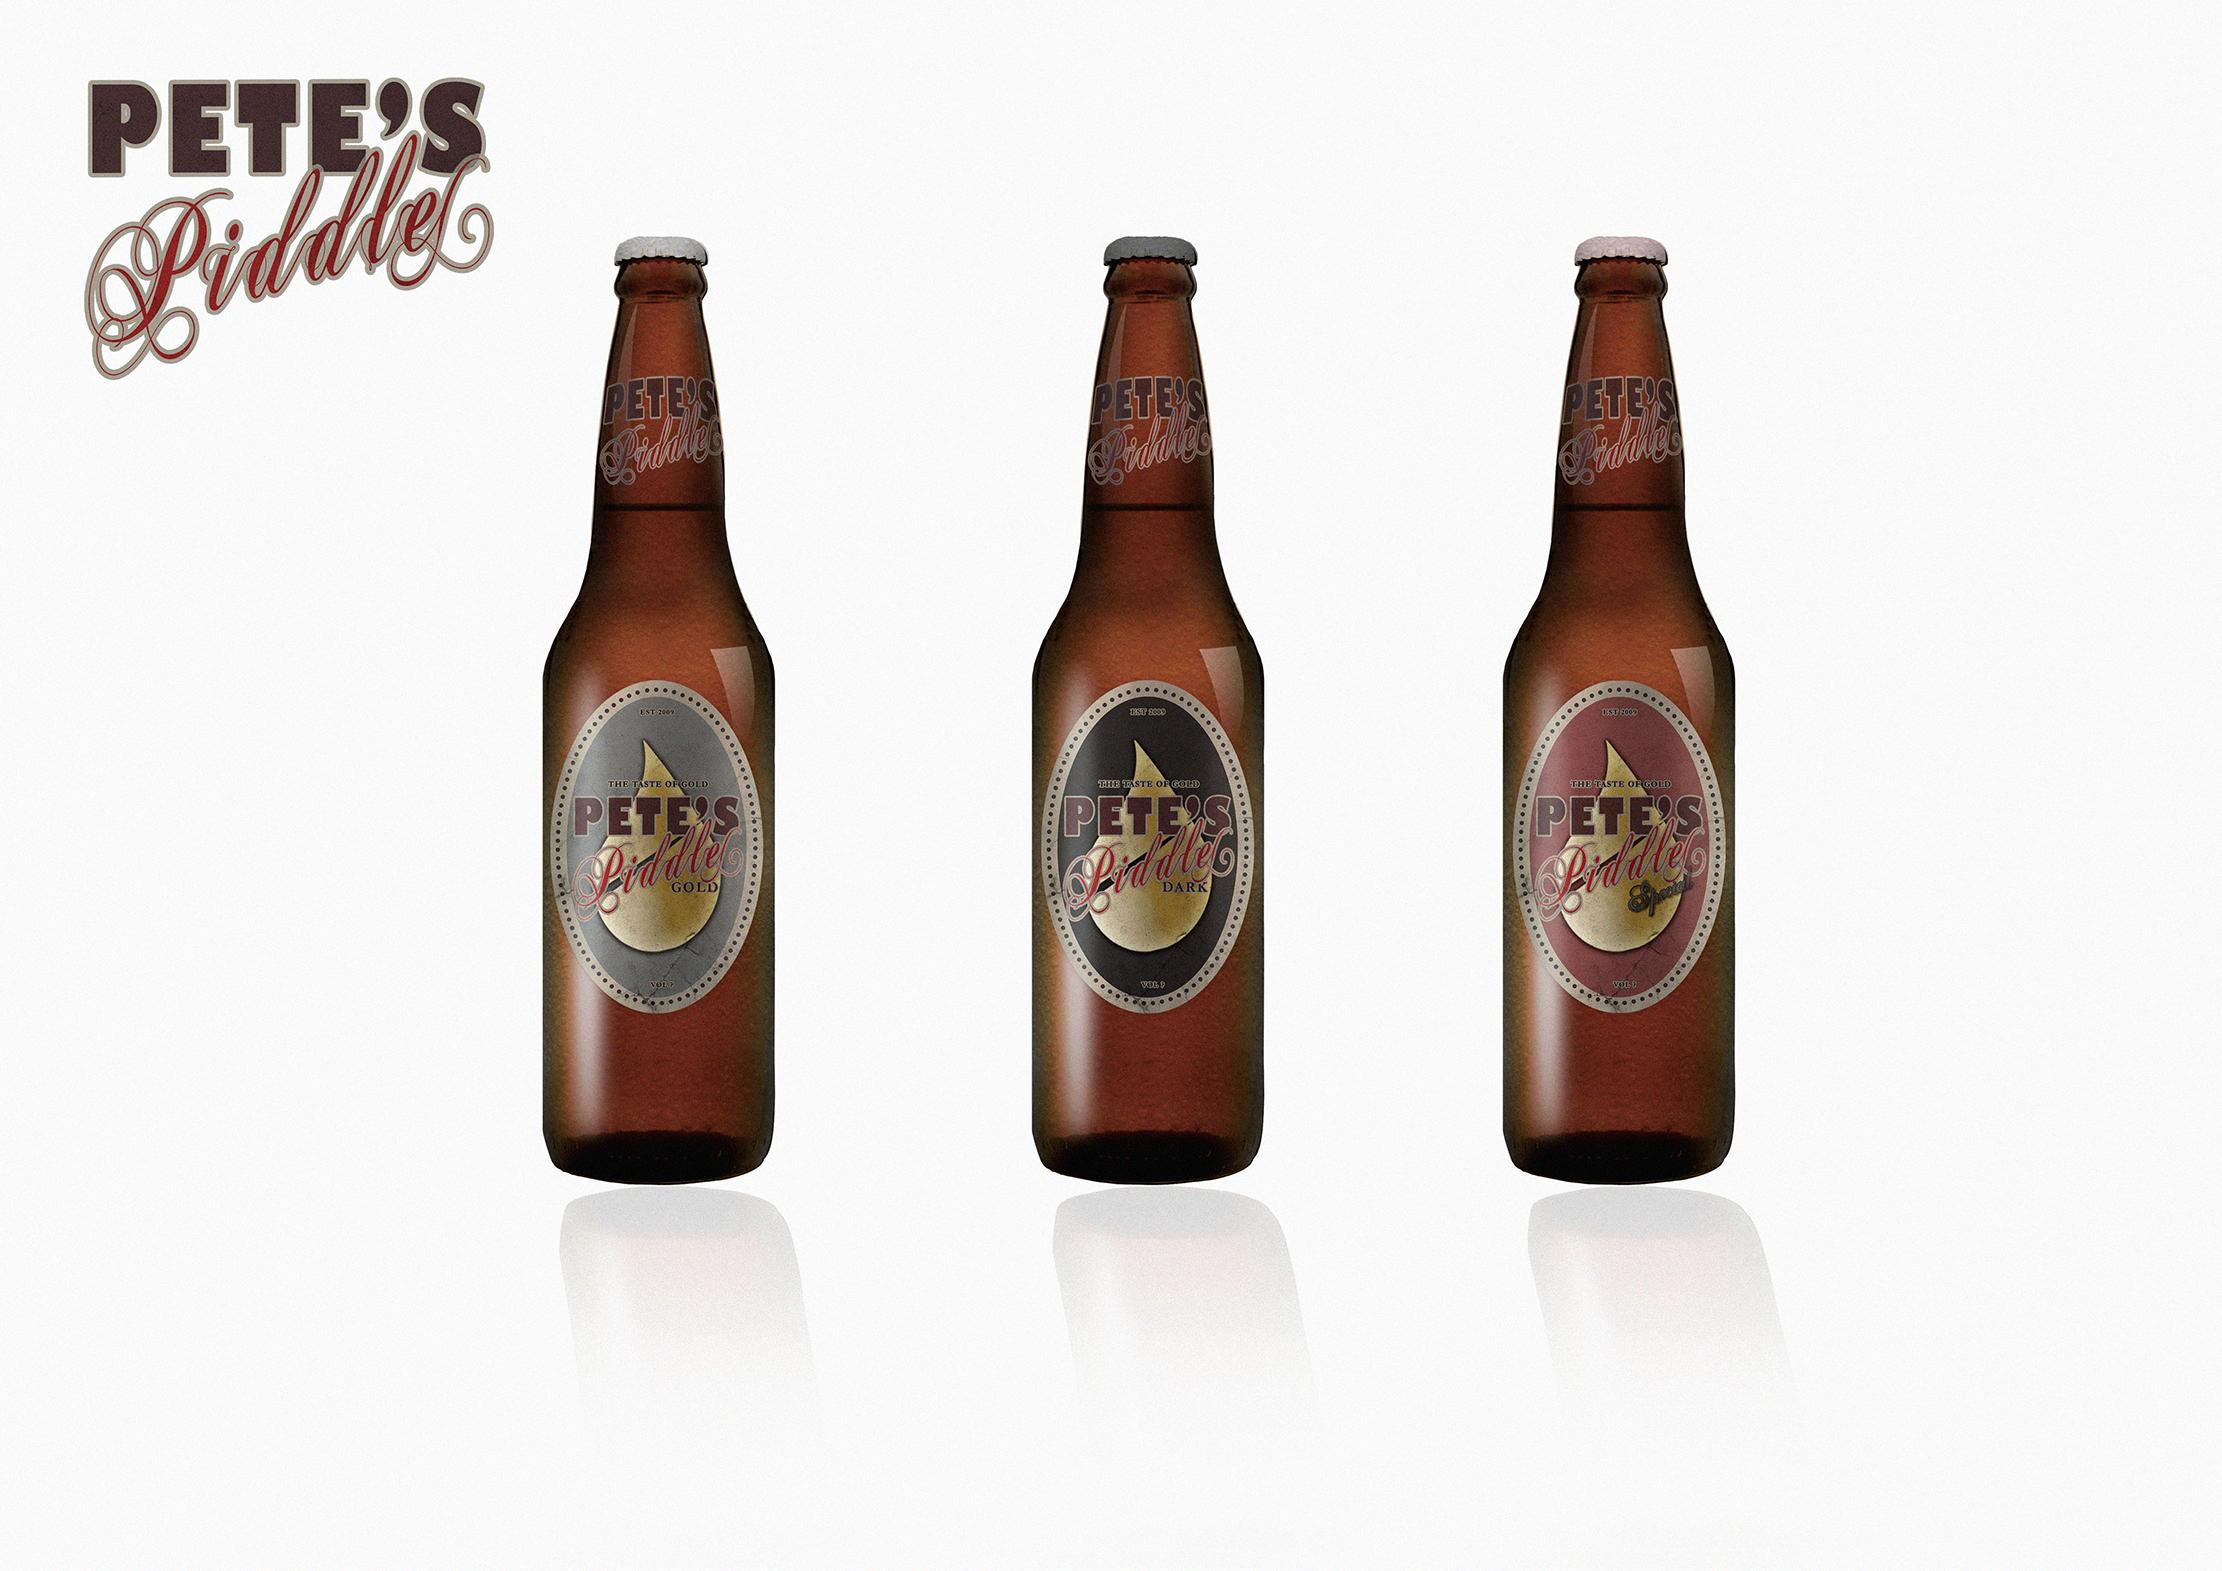 piddle bottles.jpg